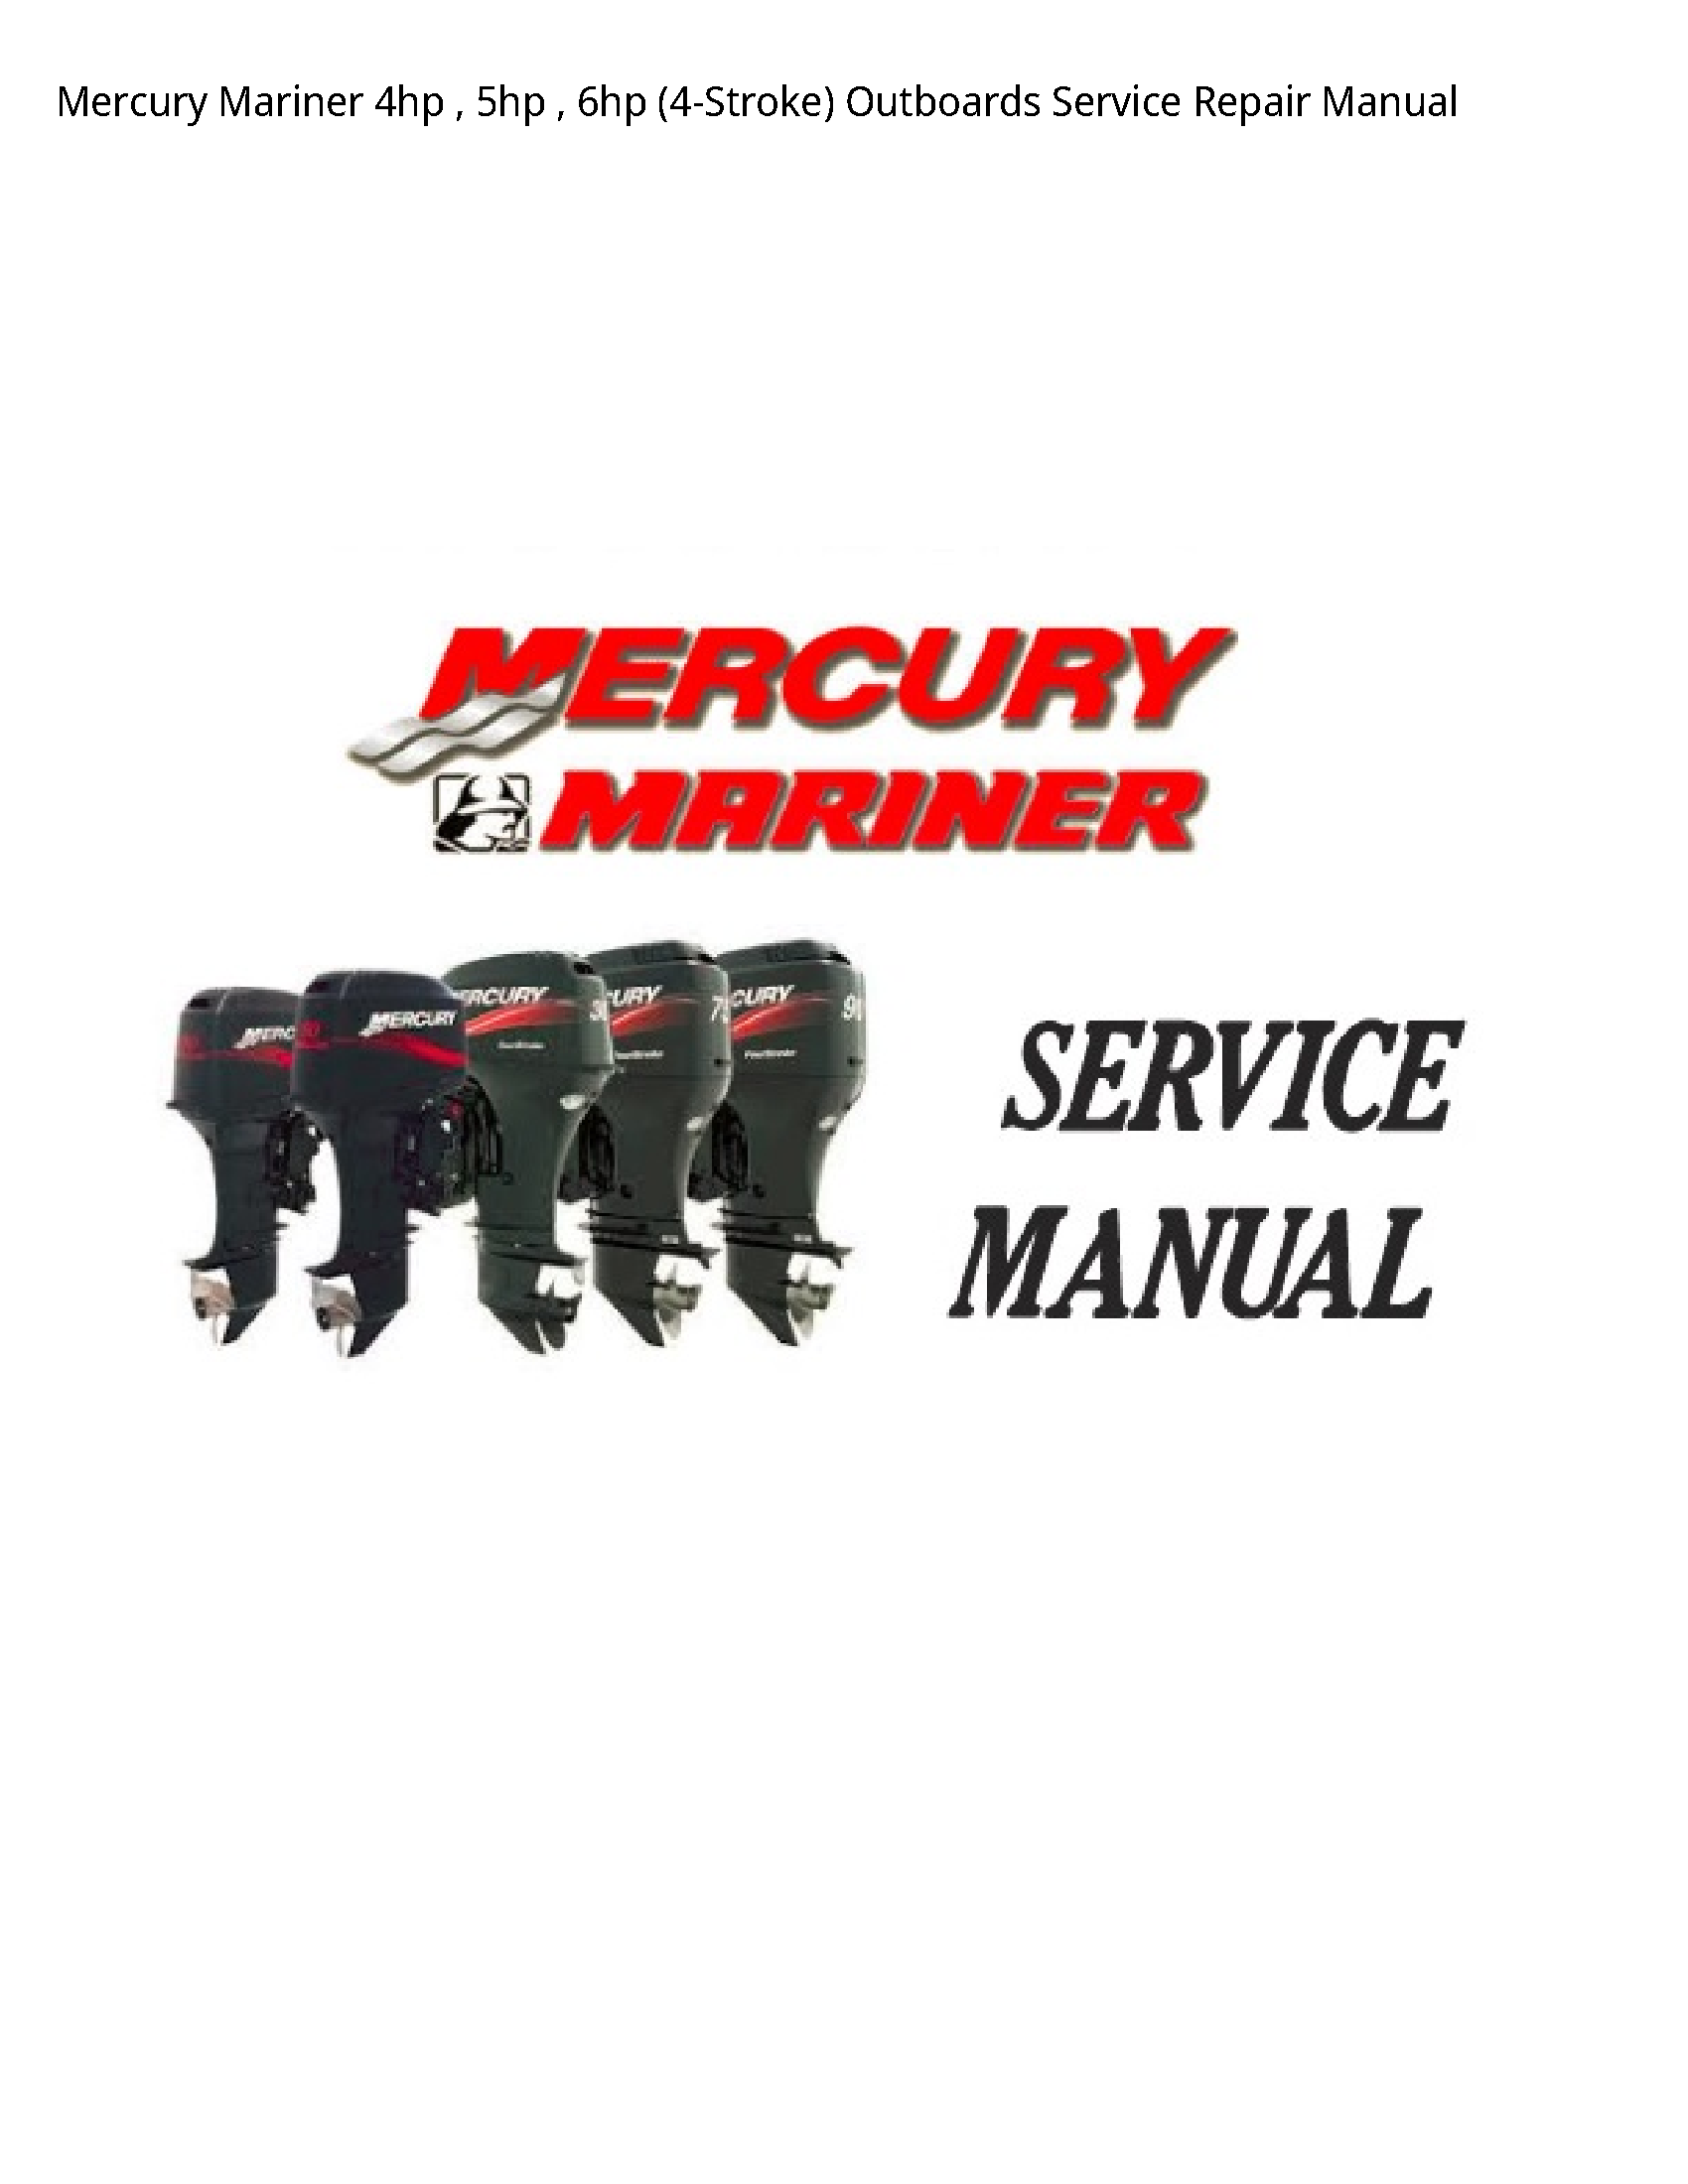 Mercury Mariner 4hp Outboards manual